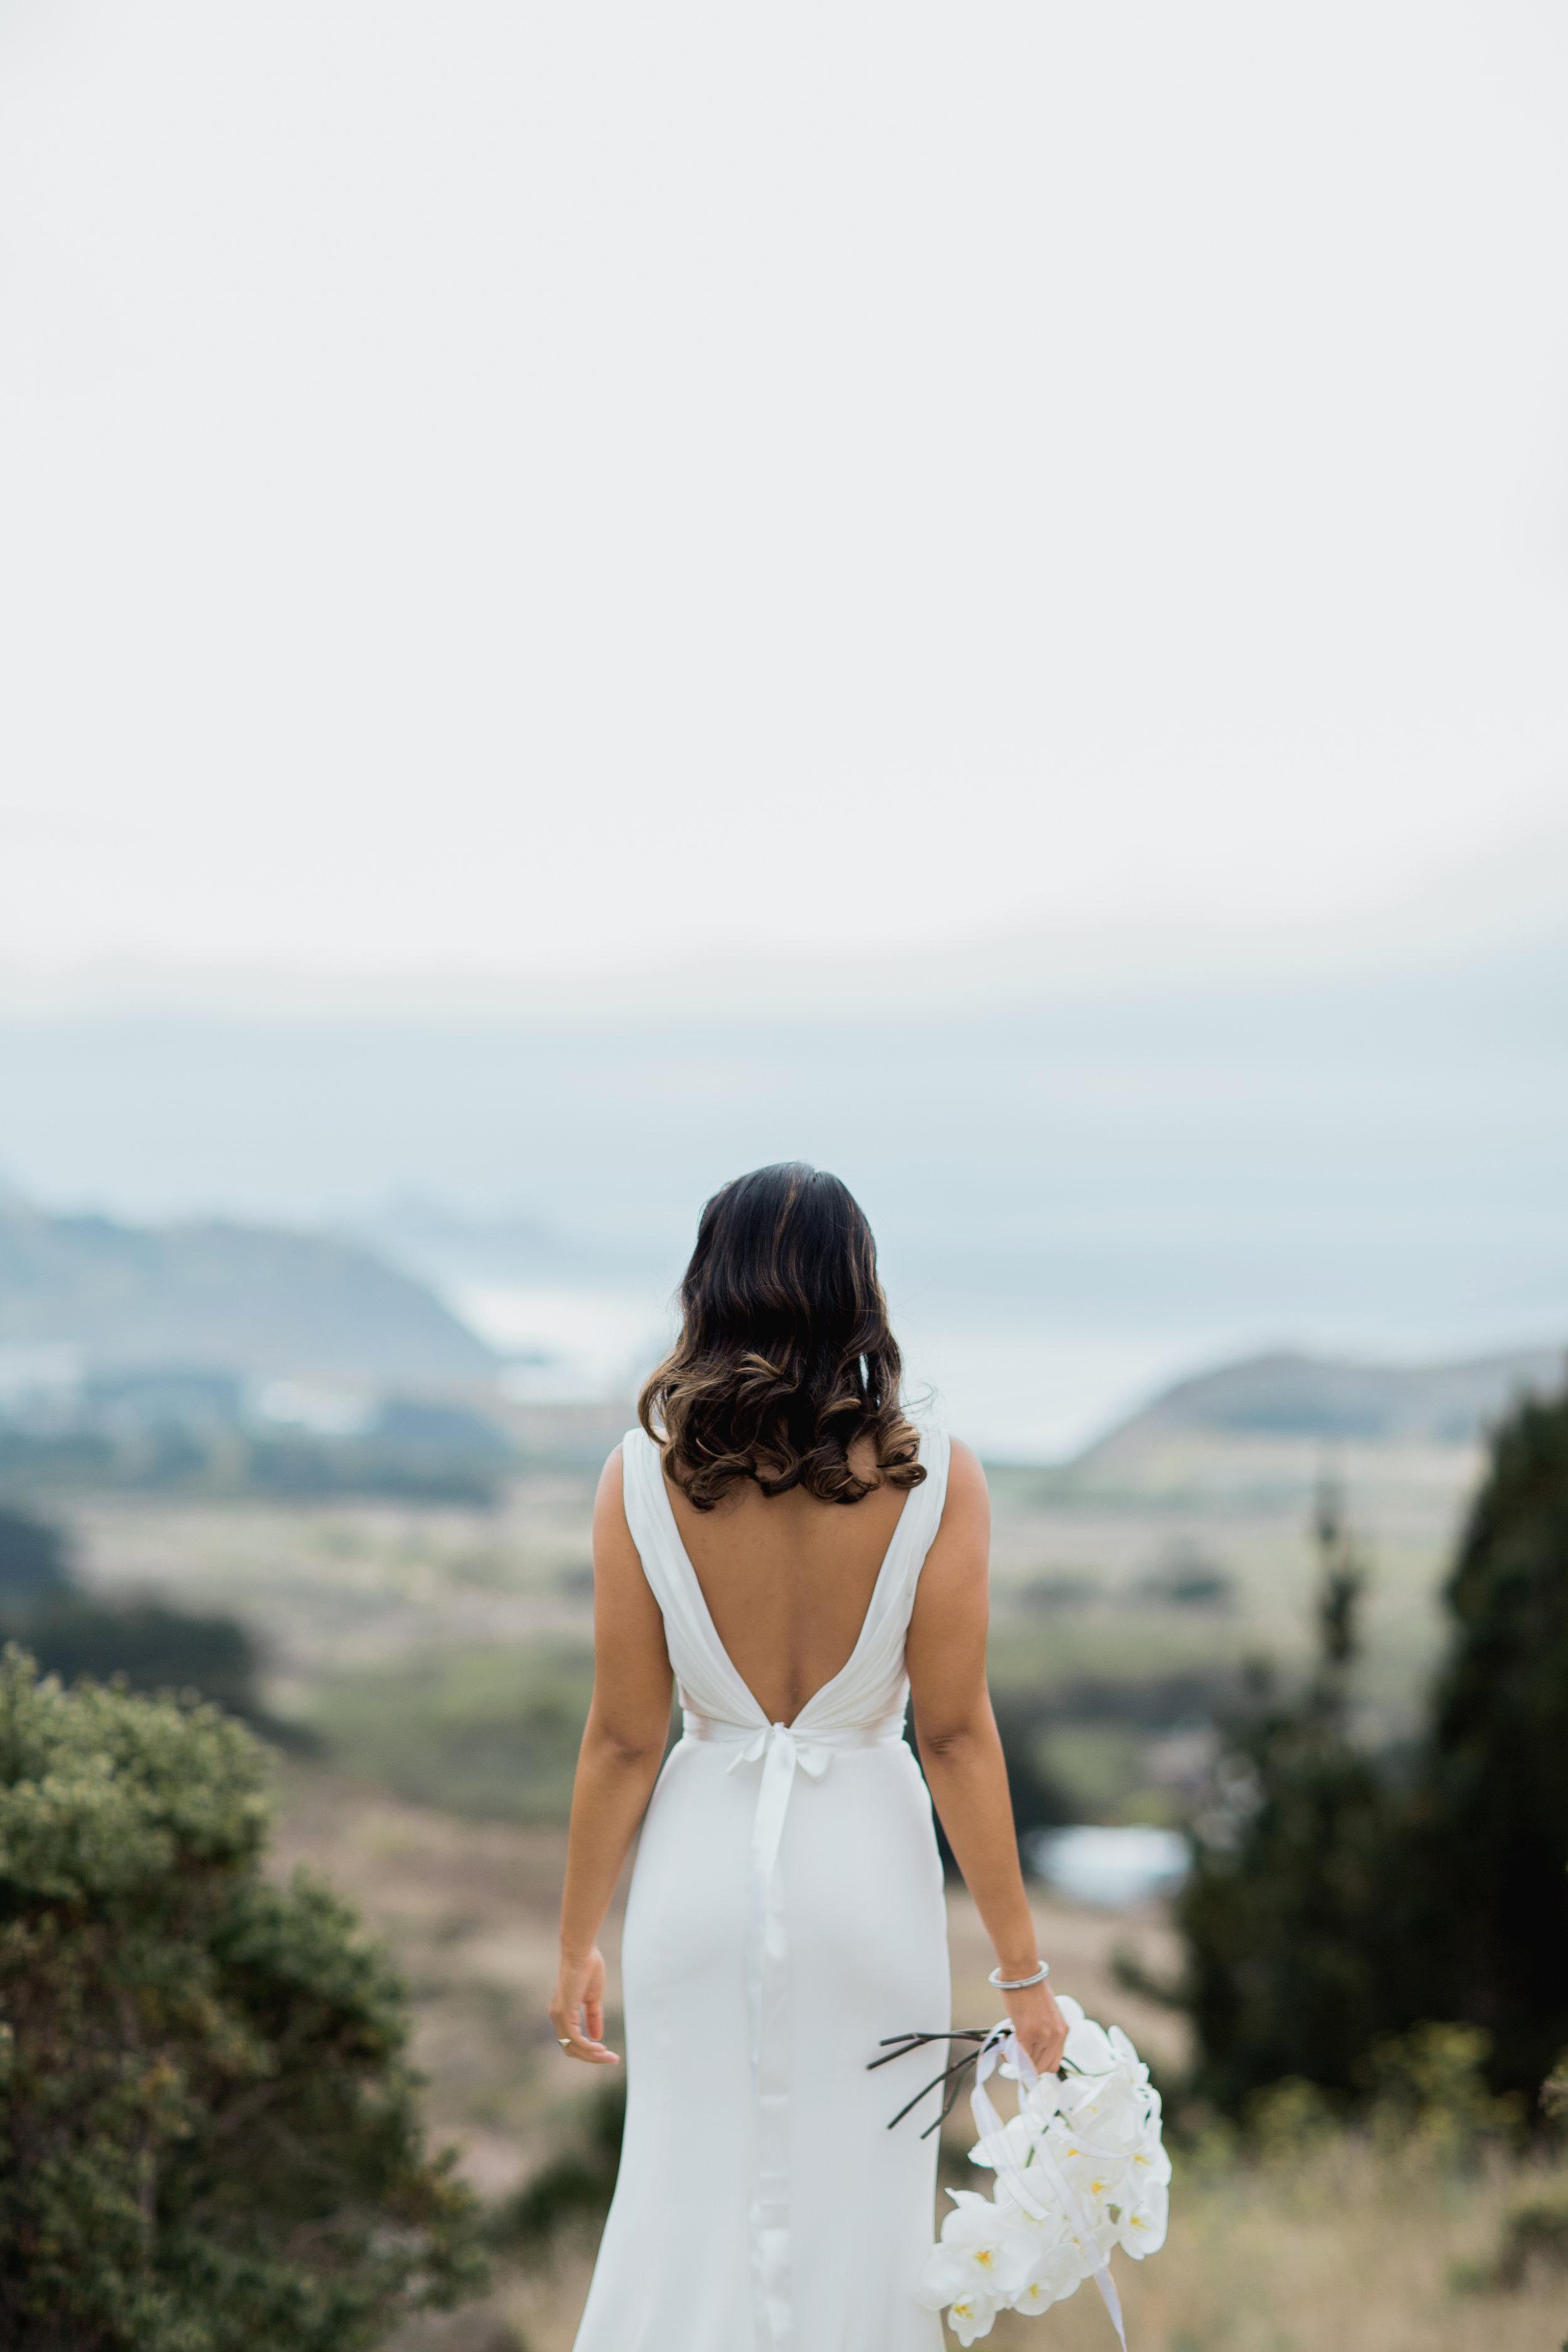 silk-crepe-v-neck-wedding-dress-4.jpg